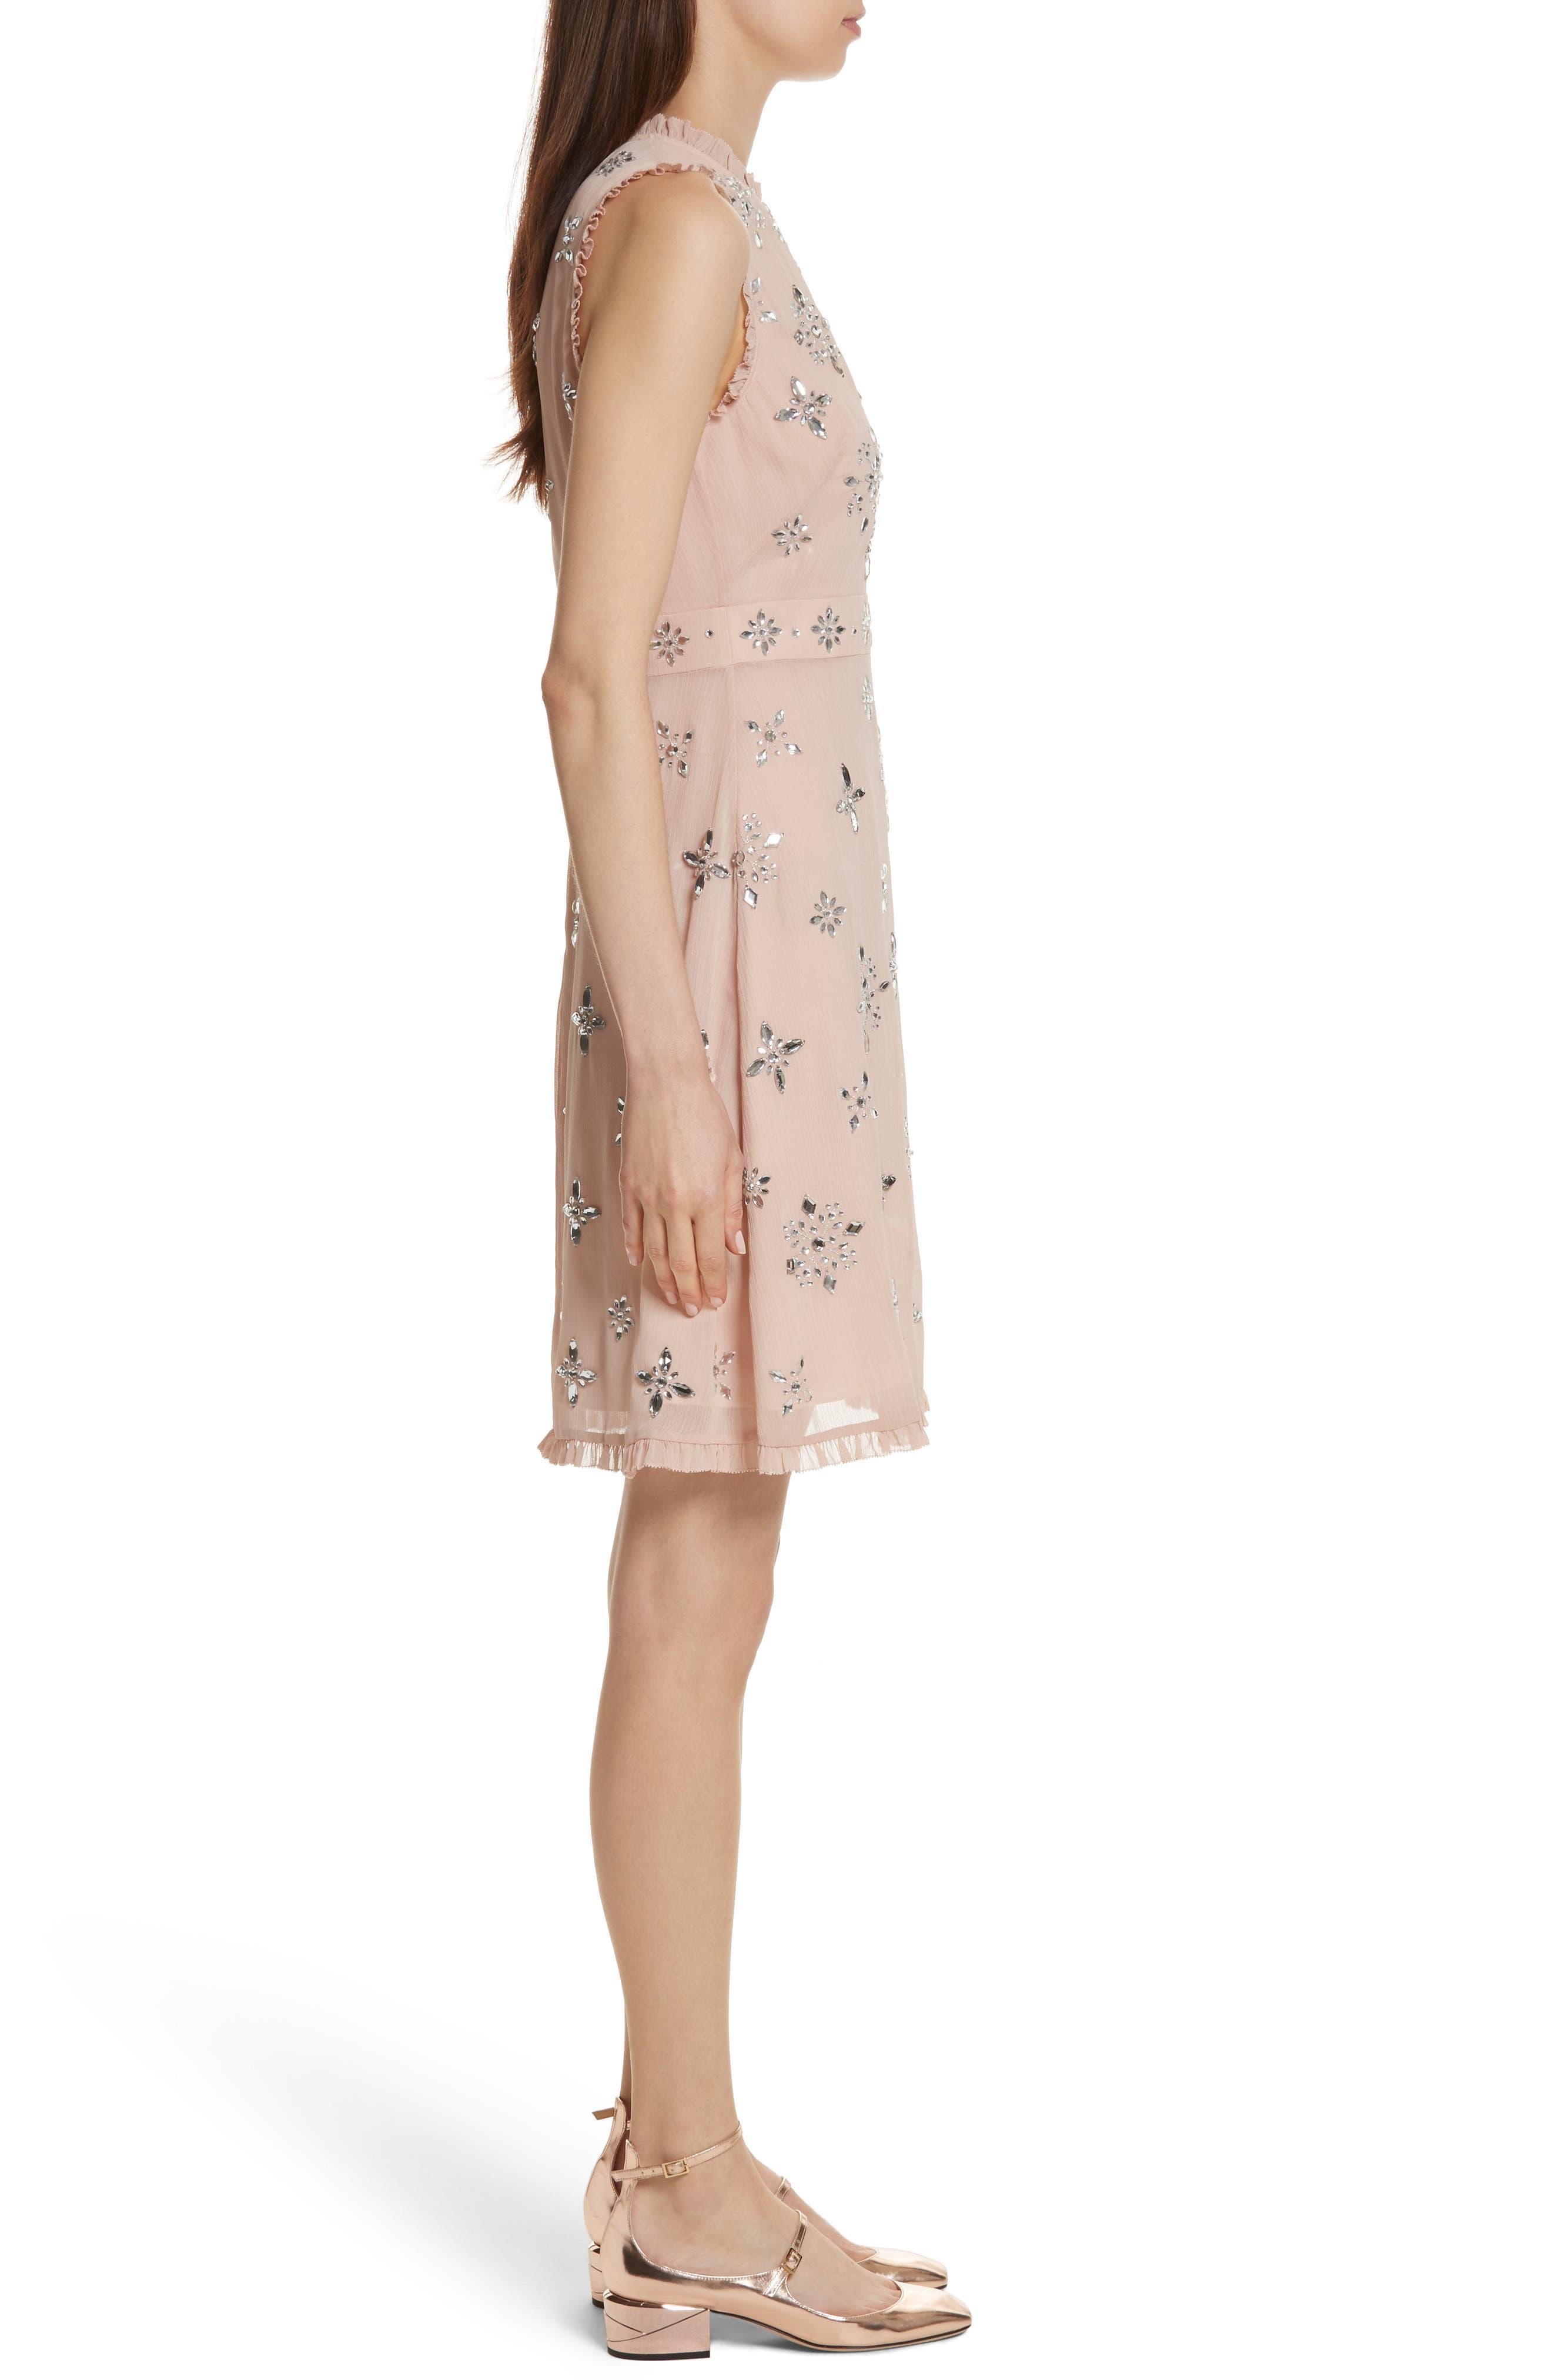 solani embellished chiffon dress,                             Alternate thumbnail 3, color,                             691